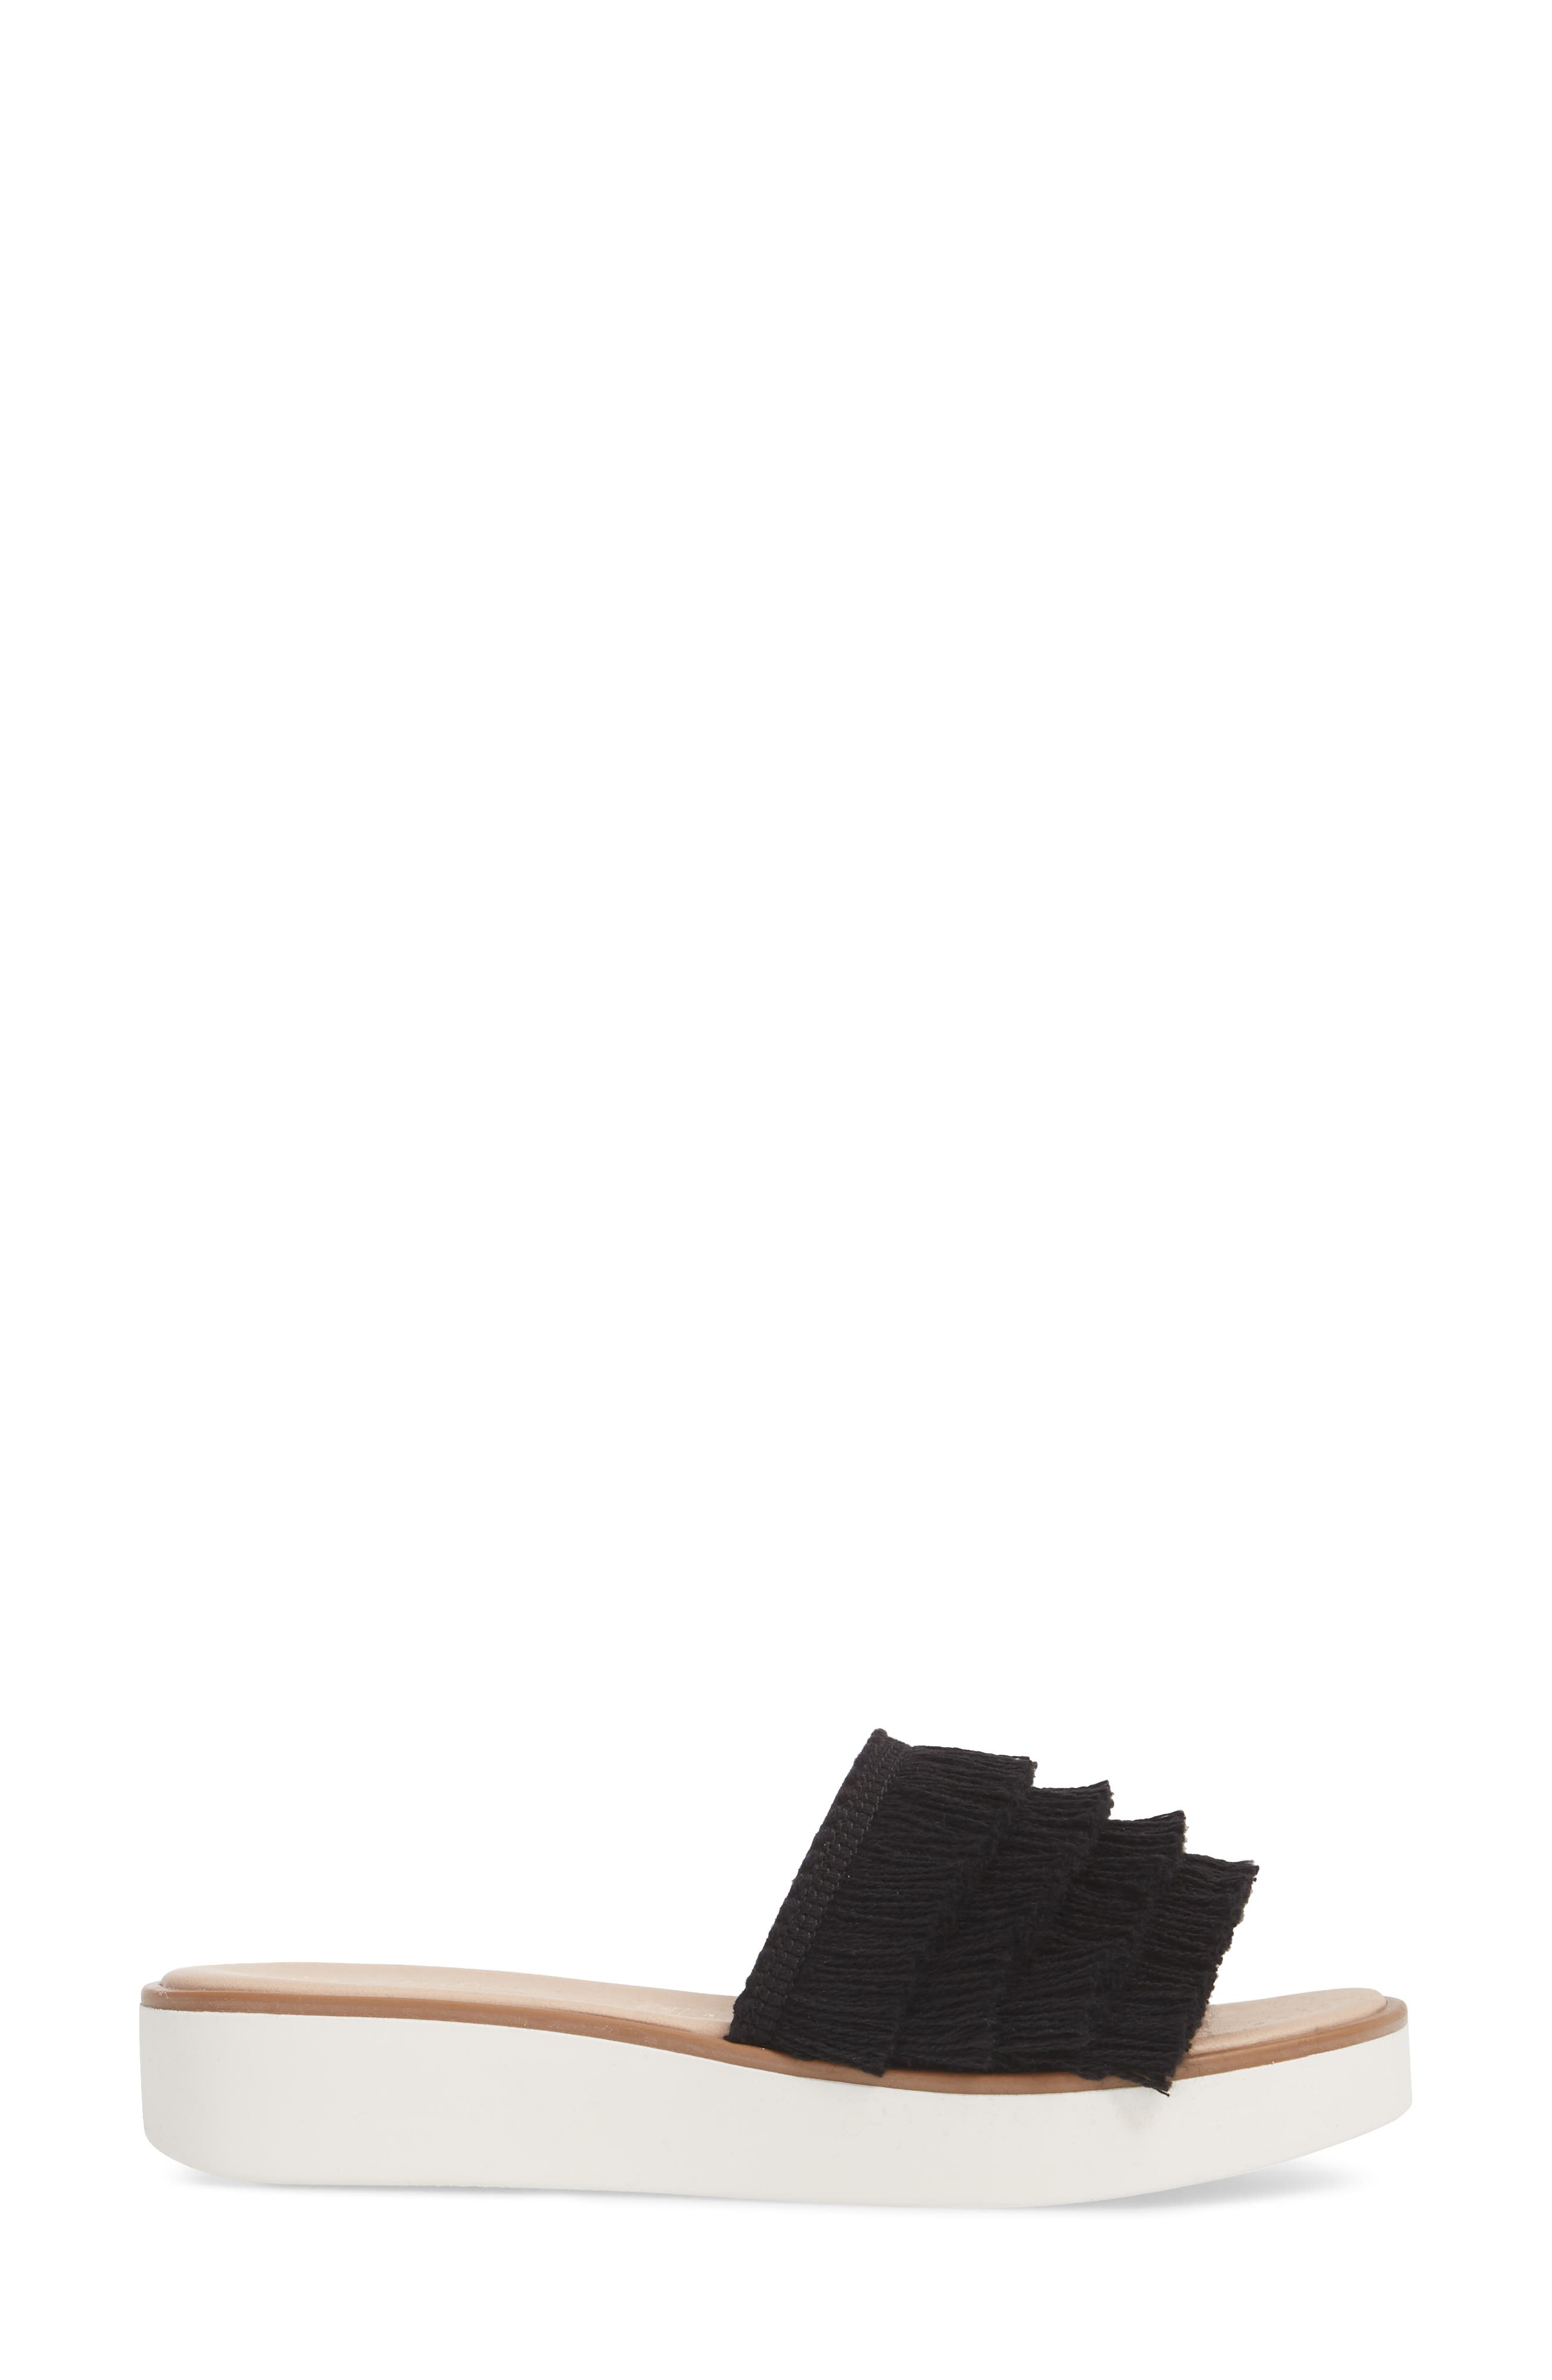 Well Rested Ruffle Slide Sandal,                             Alternate thumbnail 3, color,                             Black Fabric